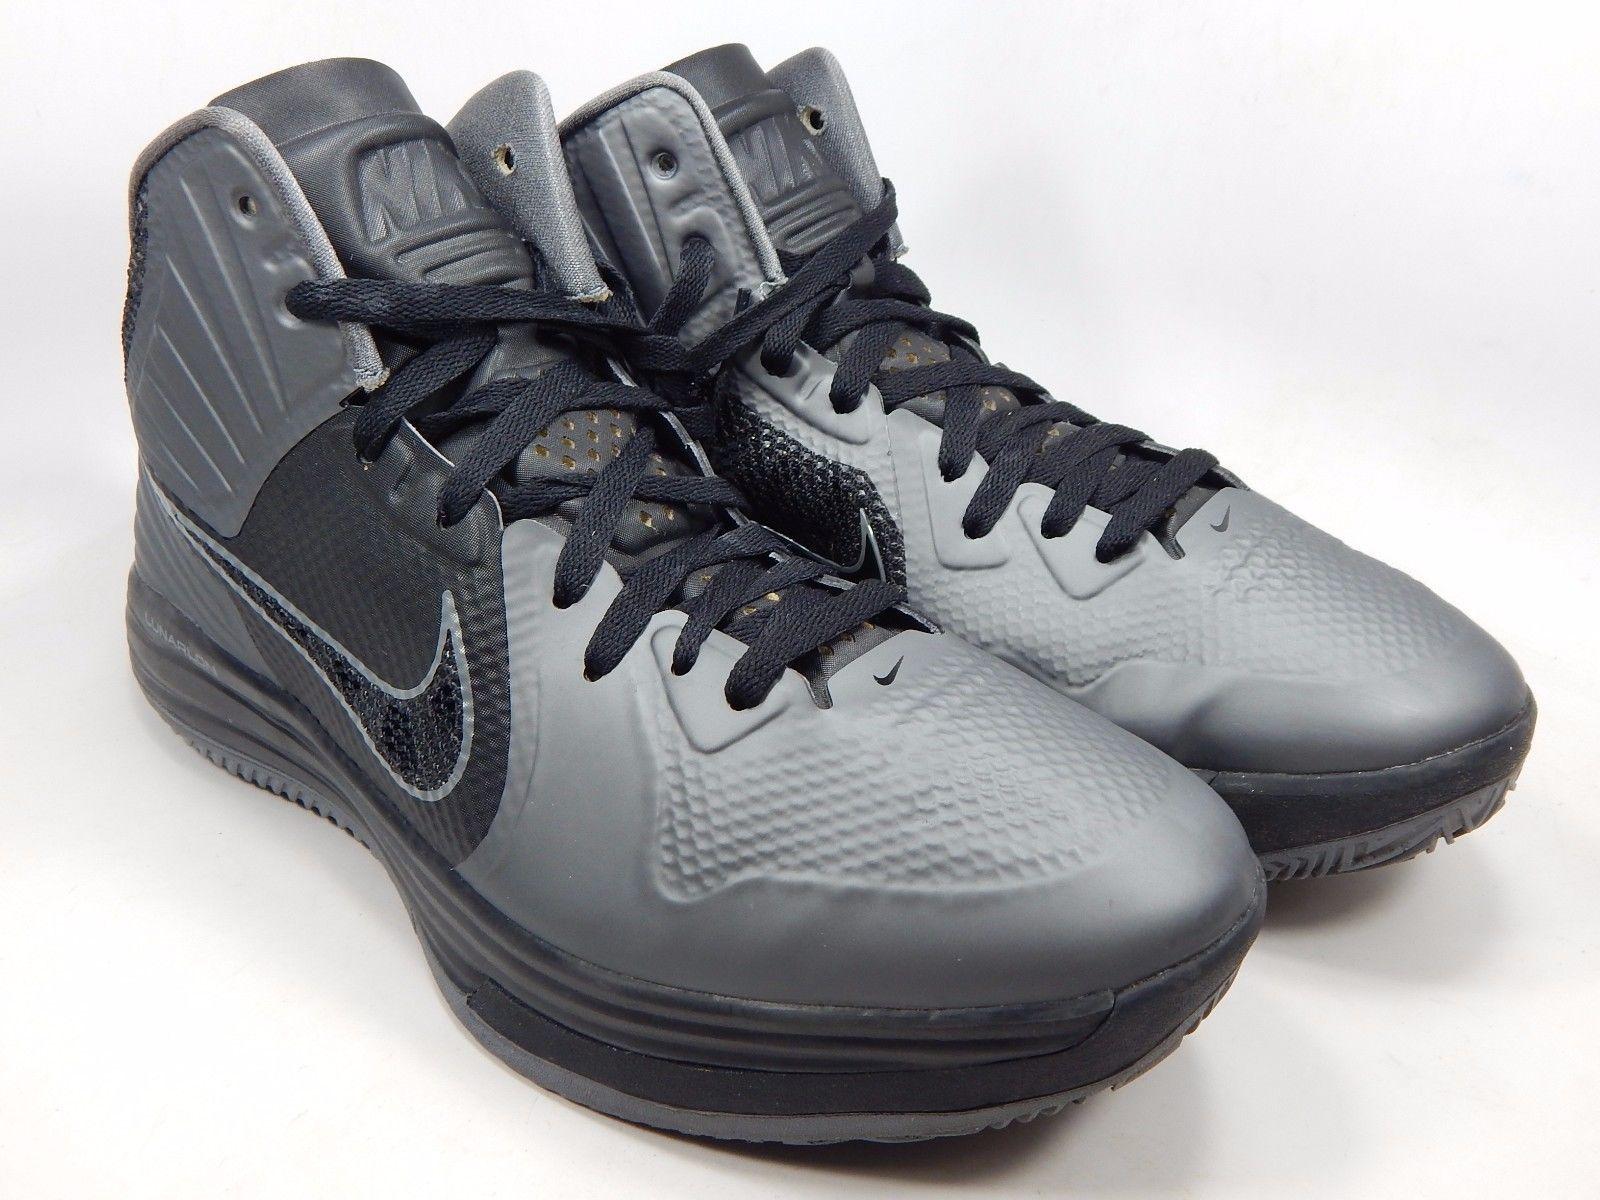 super popular a37b7 63f9f Nike Lunar HyperGamer Men s Basketball Shoes Sz US 11.5 M (D) EU 45.5  469756-007